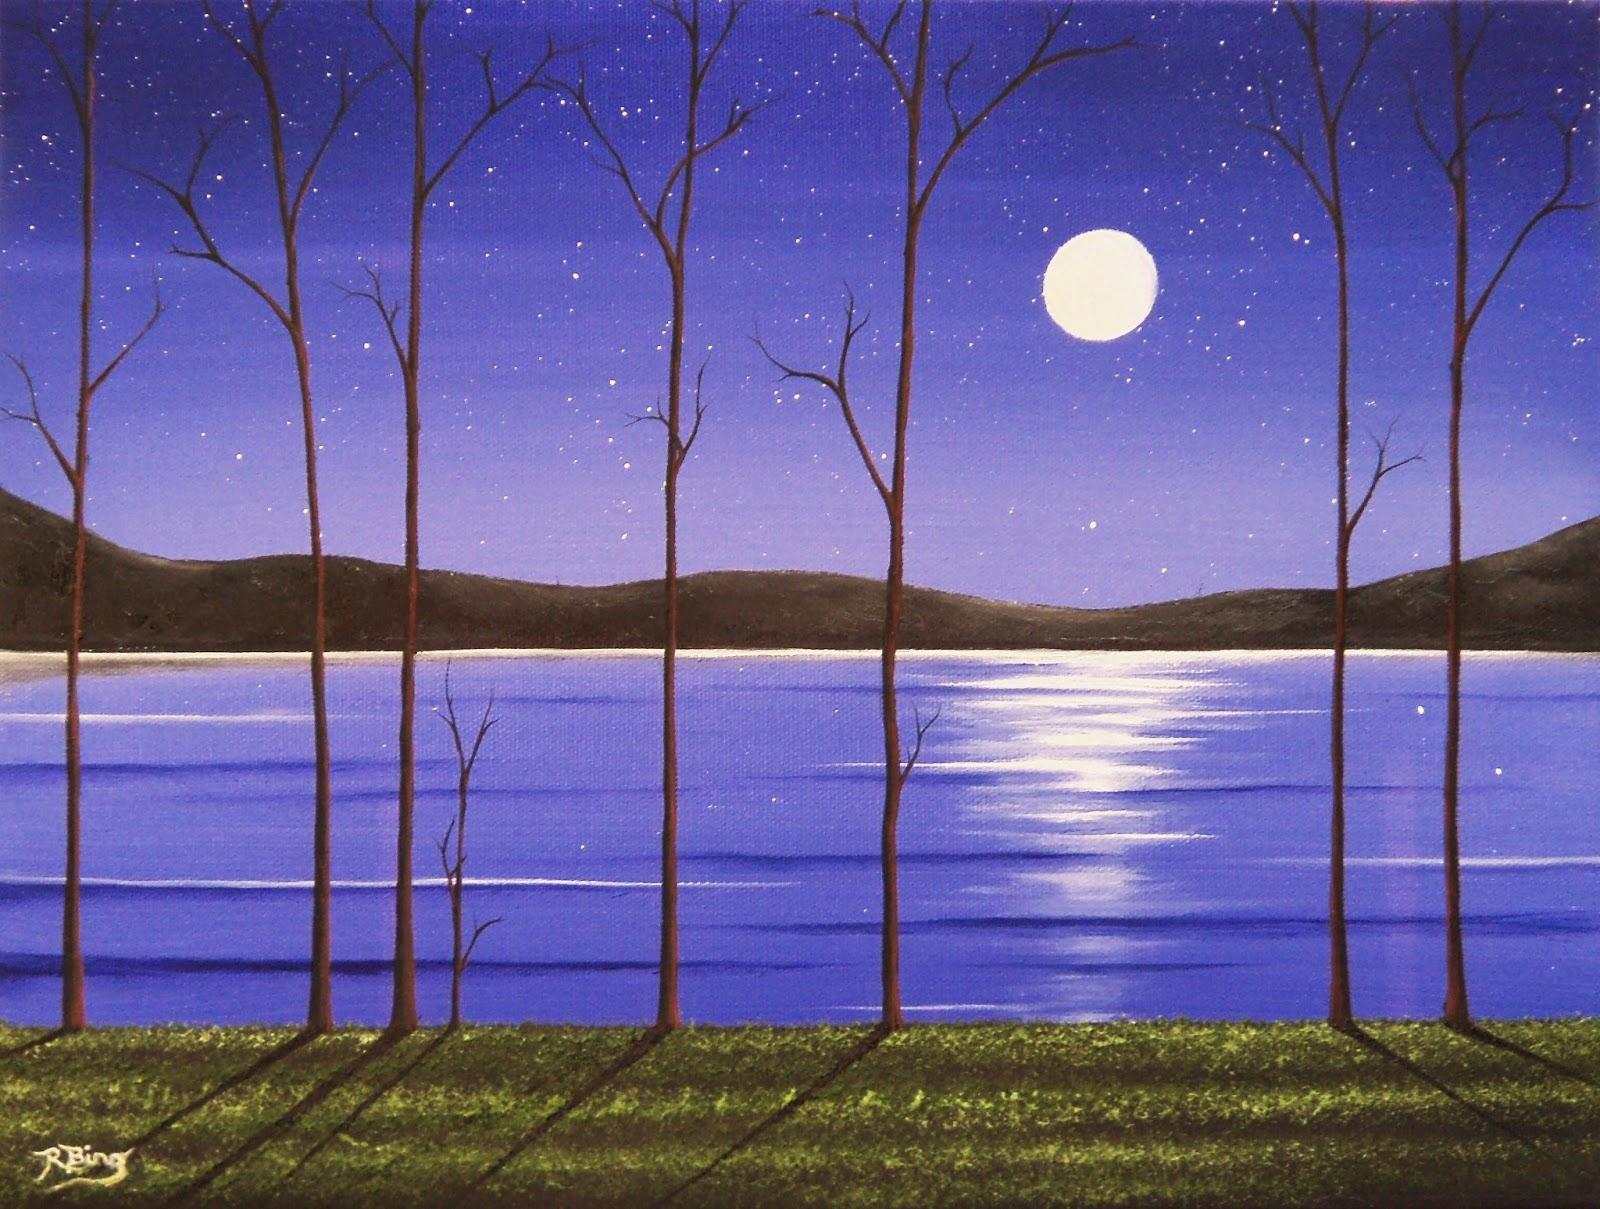 easy night scene paintings - photo #10